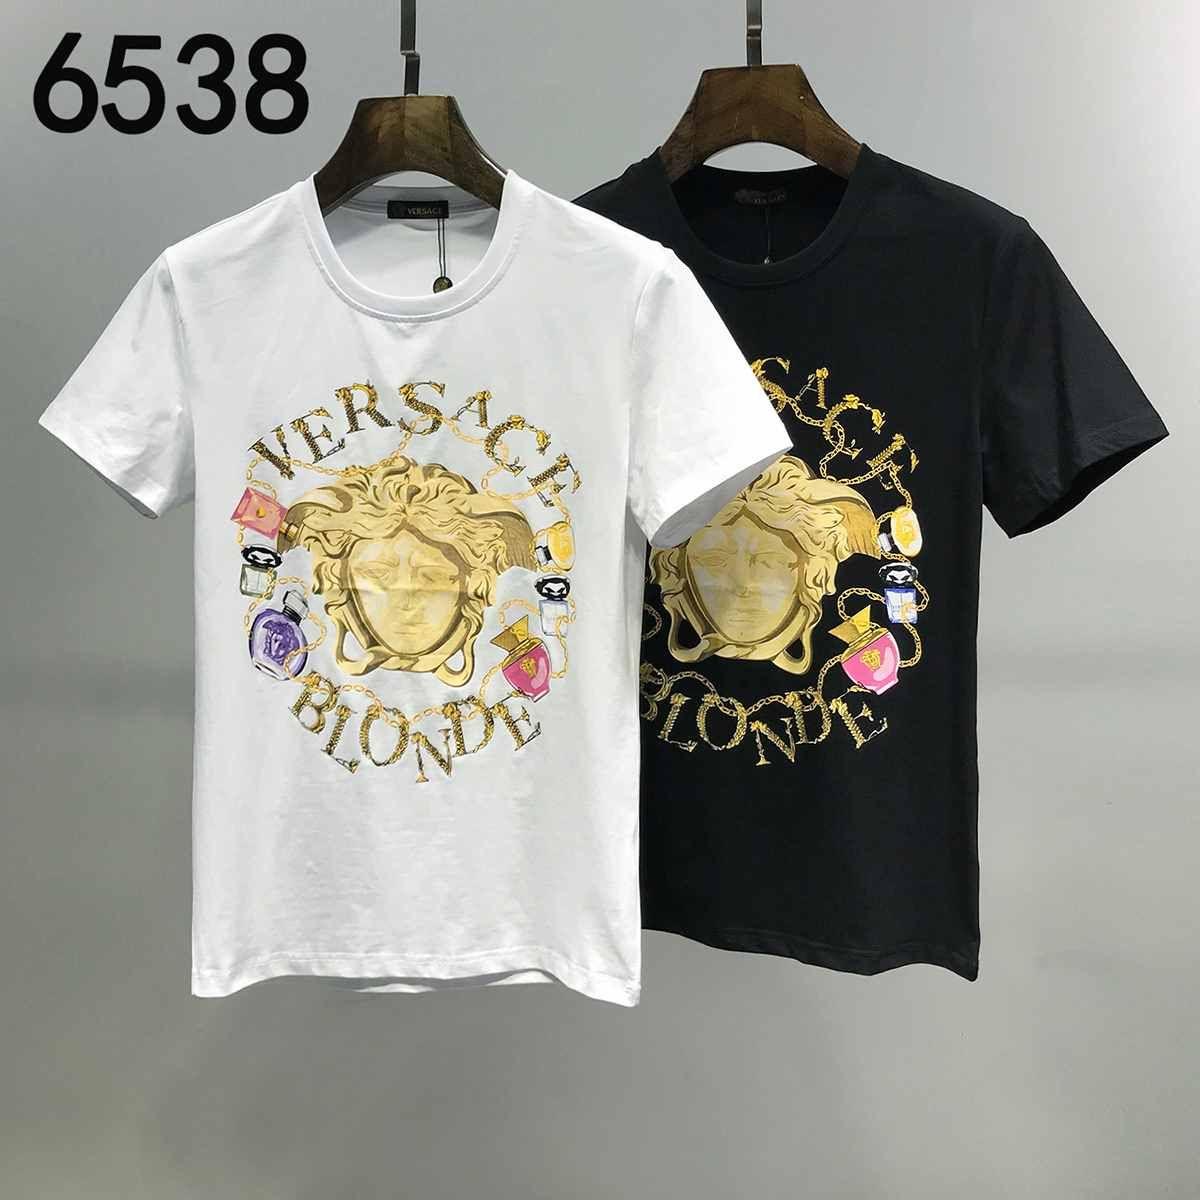 Мужская футболка 2020 Summer New Designer Luxury T-shirt с коротким рукавом Image Print Black White Funny Top мужская футболка № 6538